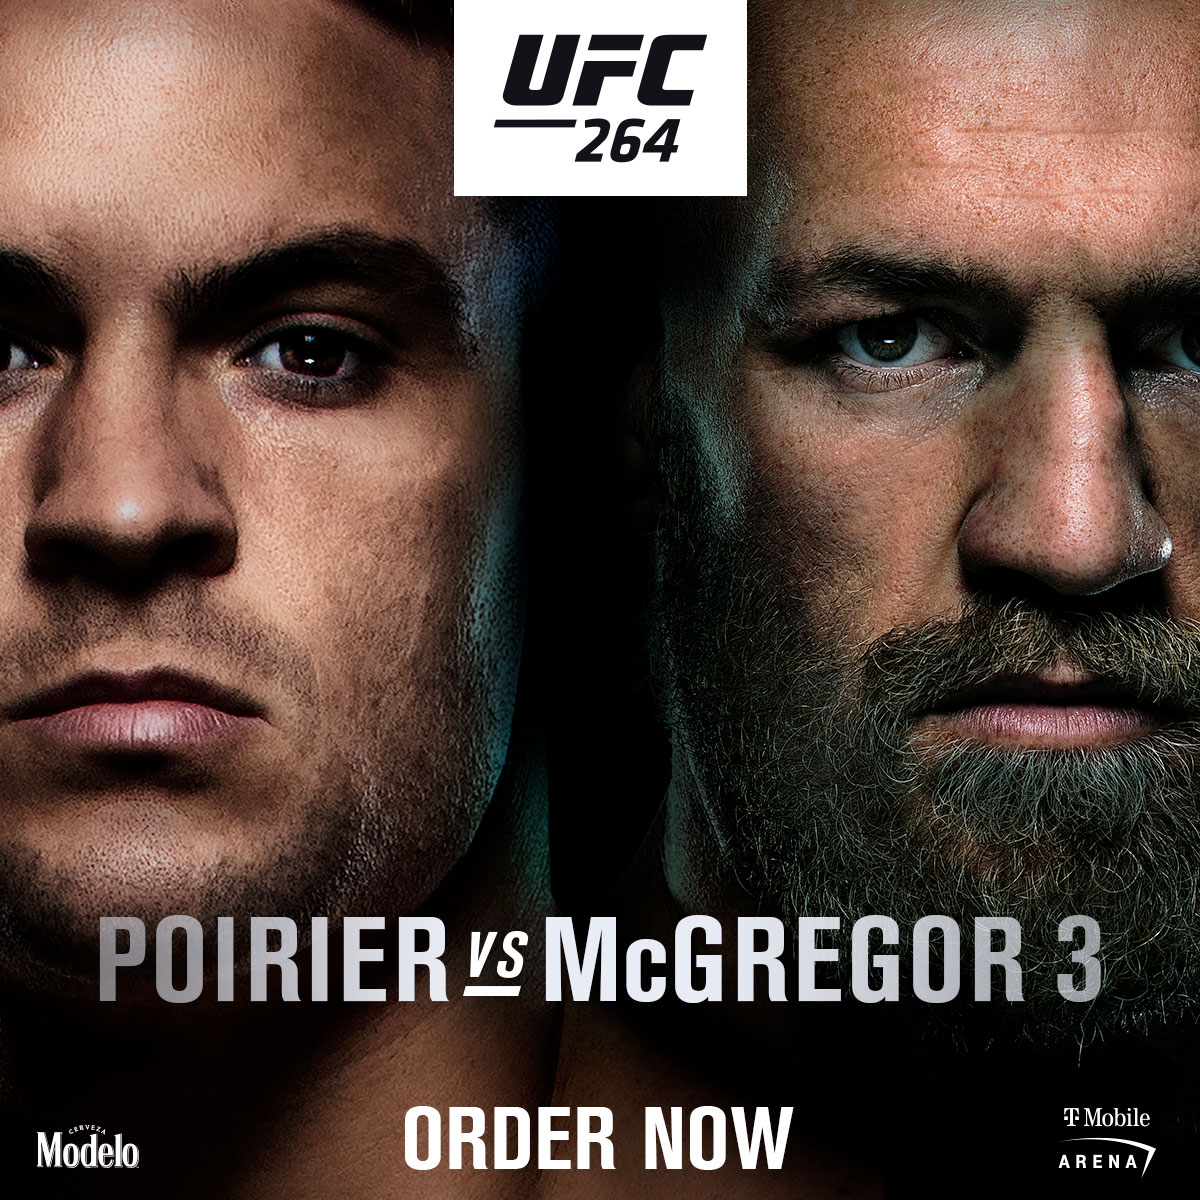 Order UFC 264